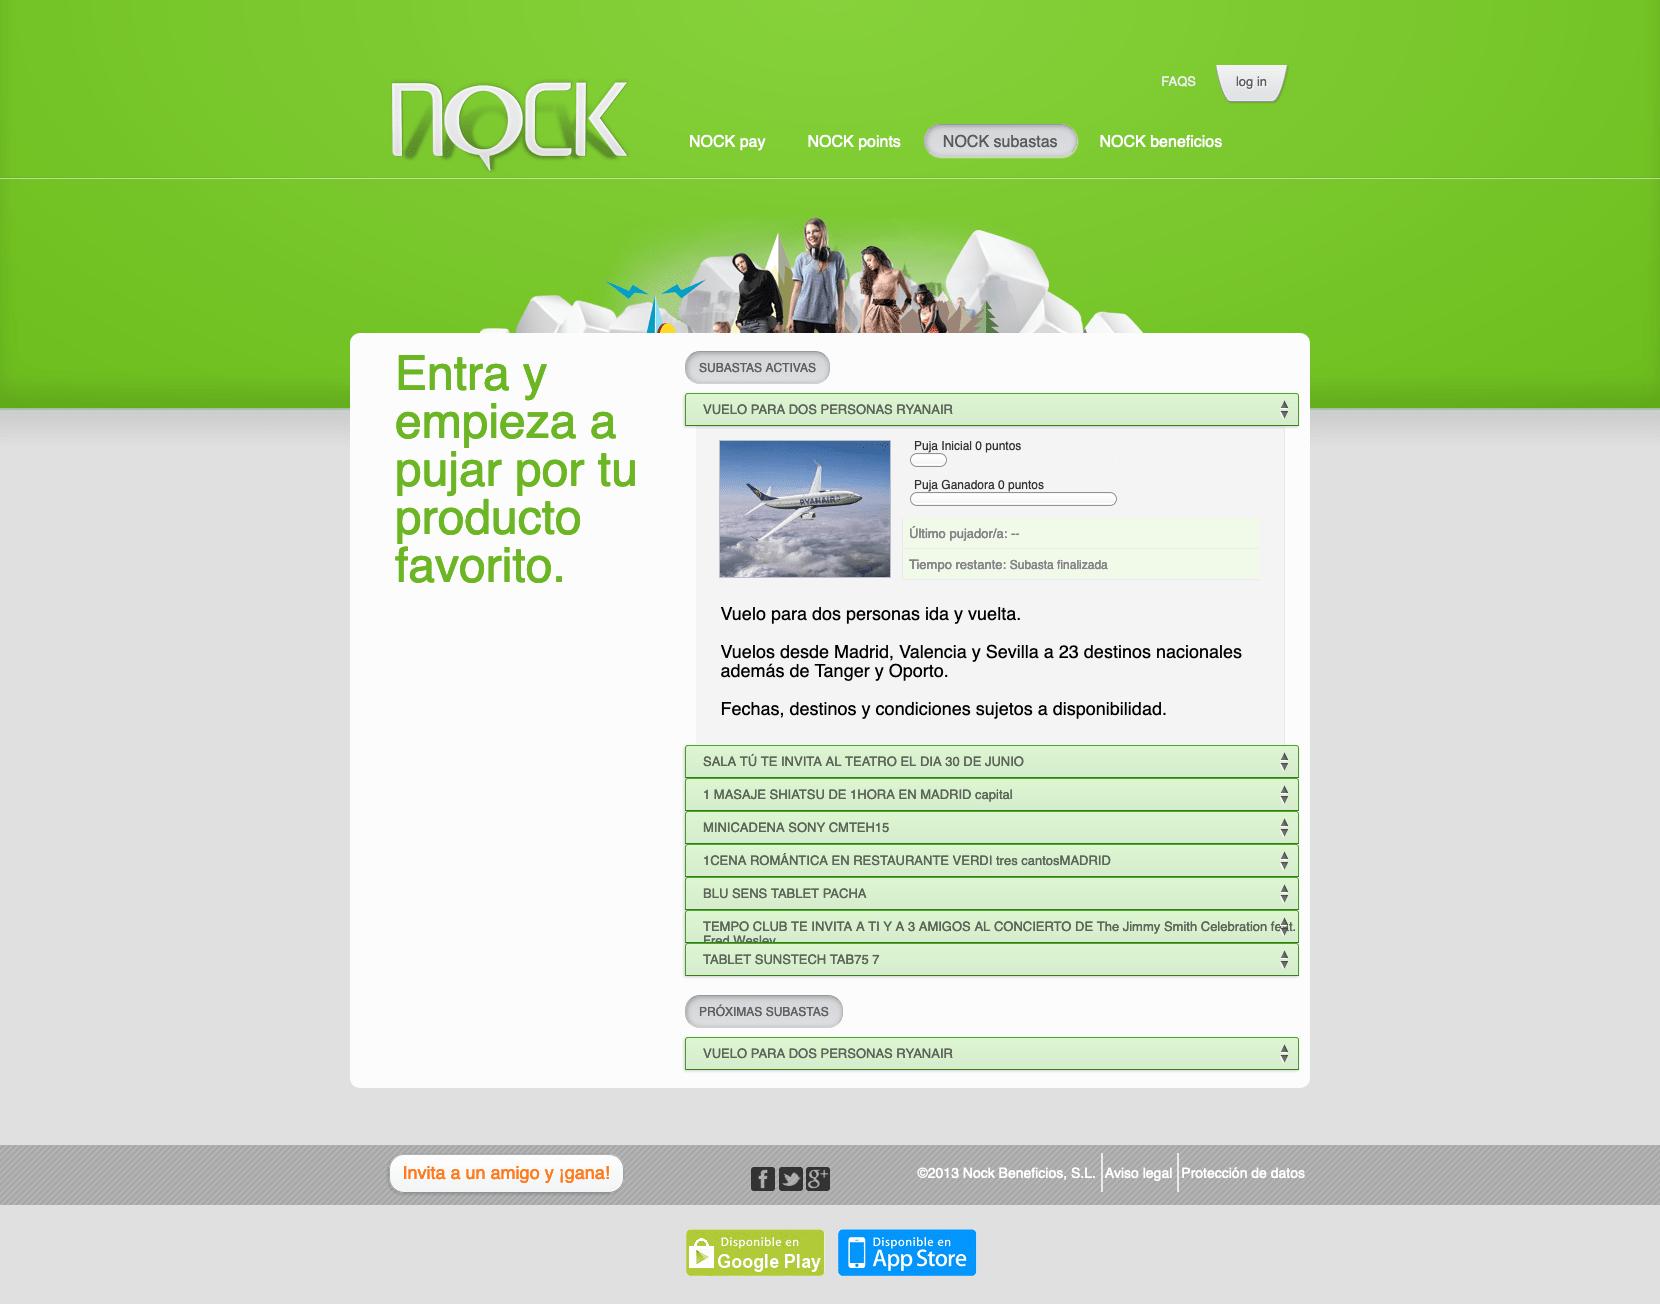 -Nock